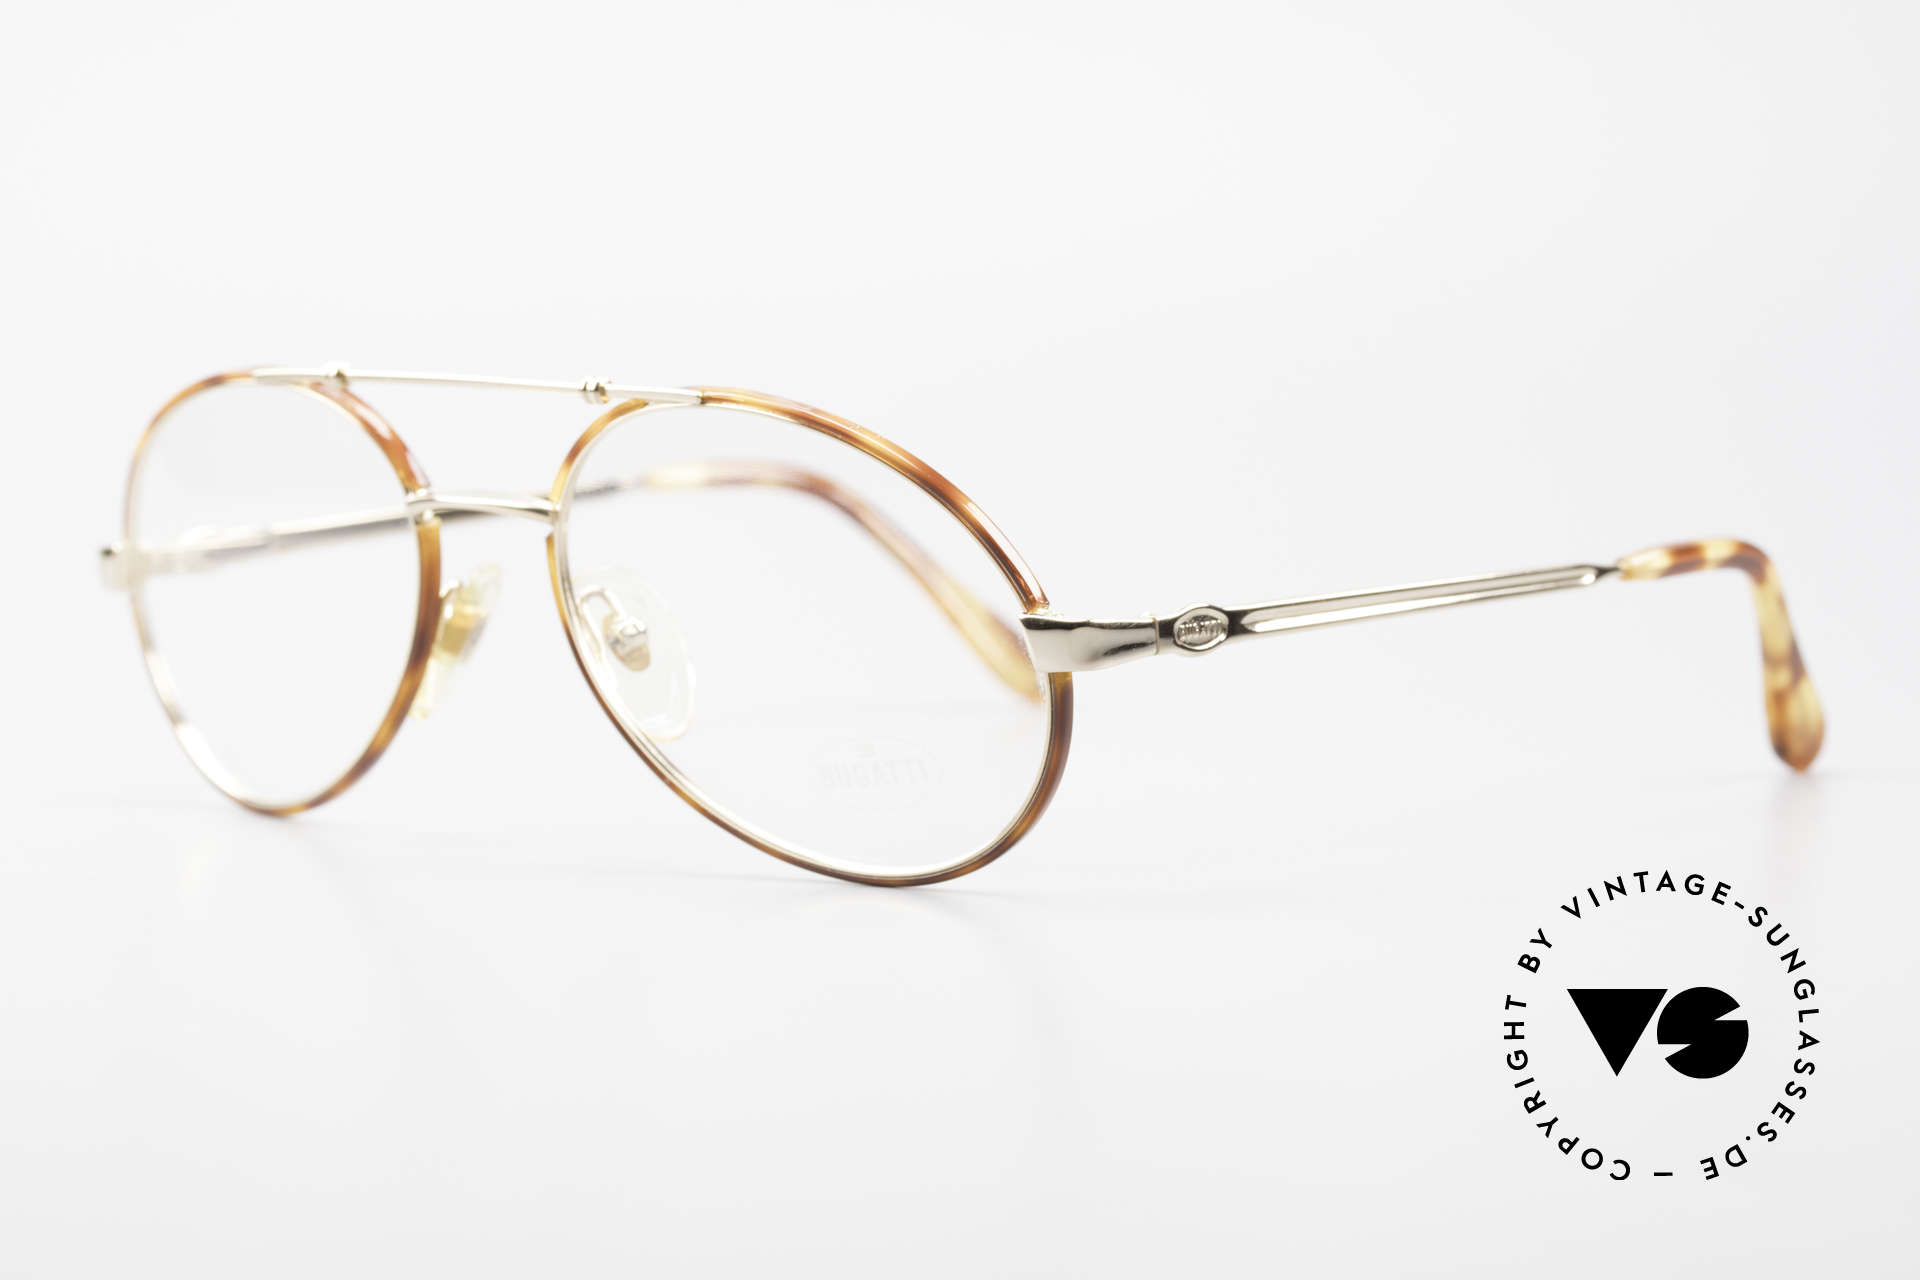 Bugatti 14782 Luxury 80's Eyeglass-Frame, 1st class wearing comfort (flexible spring hinges), Made for Men